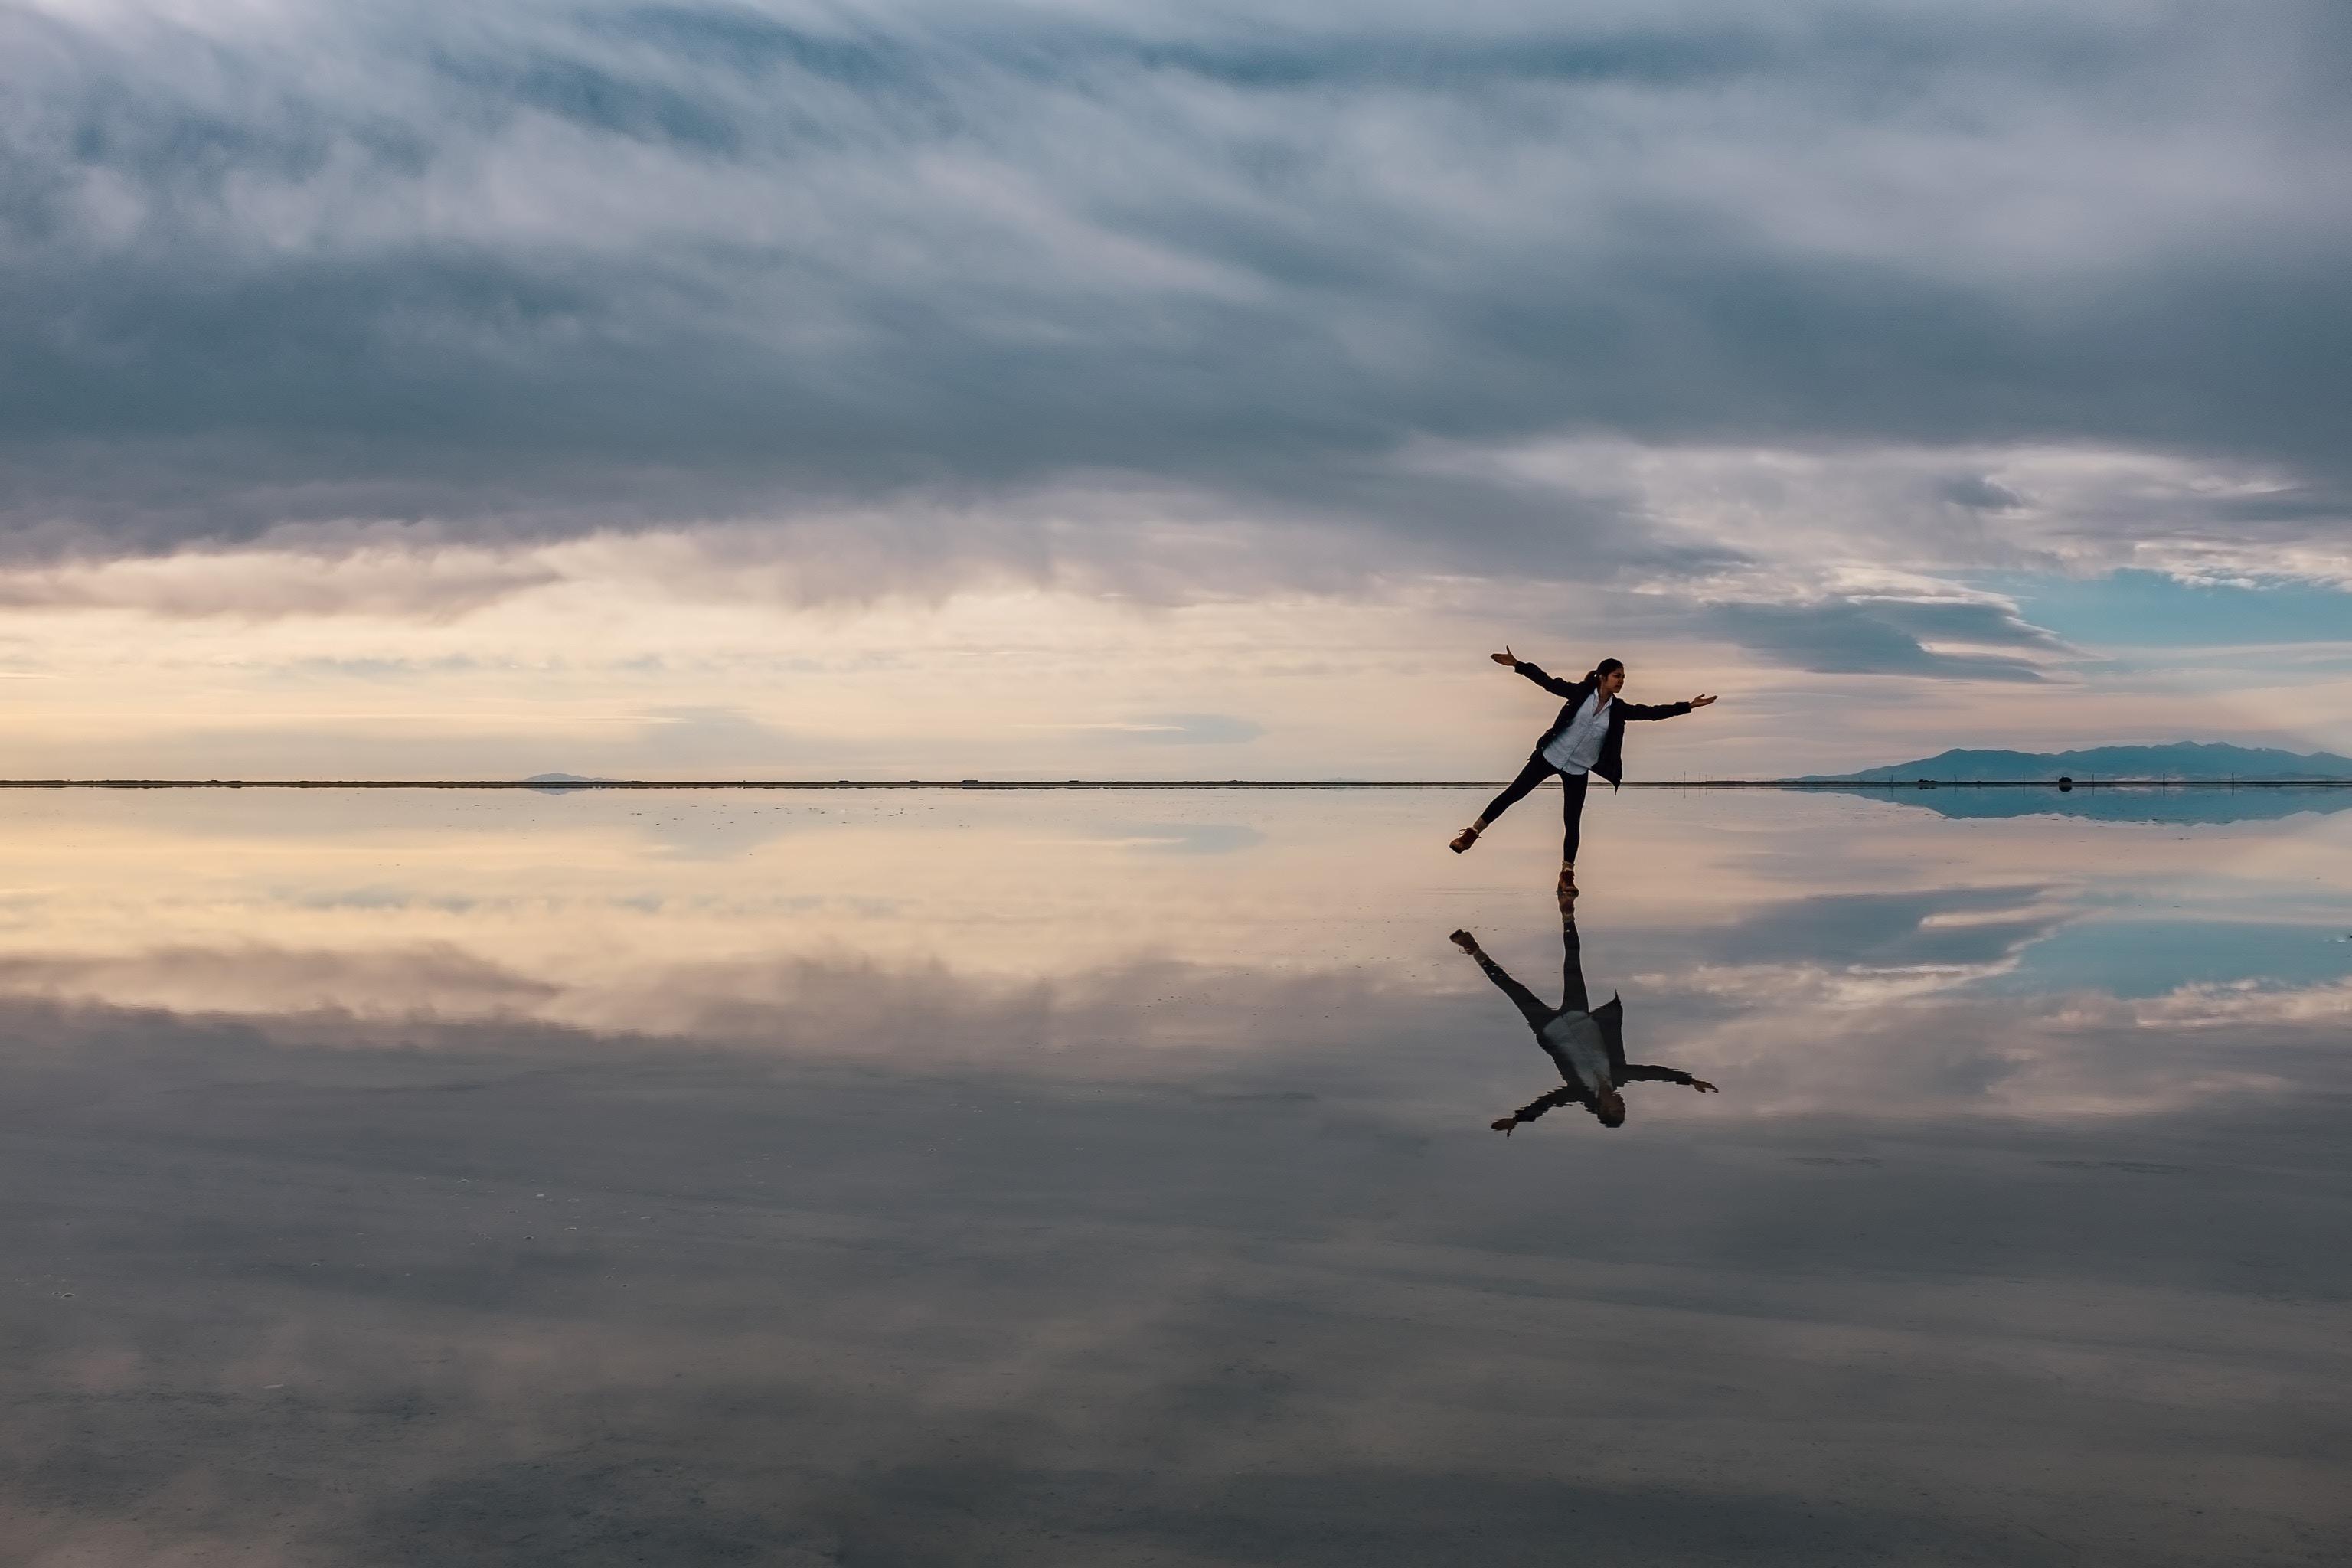 woman's reflection on lake, self-reflection